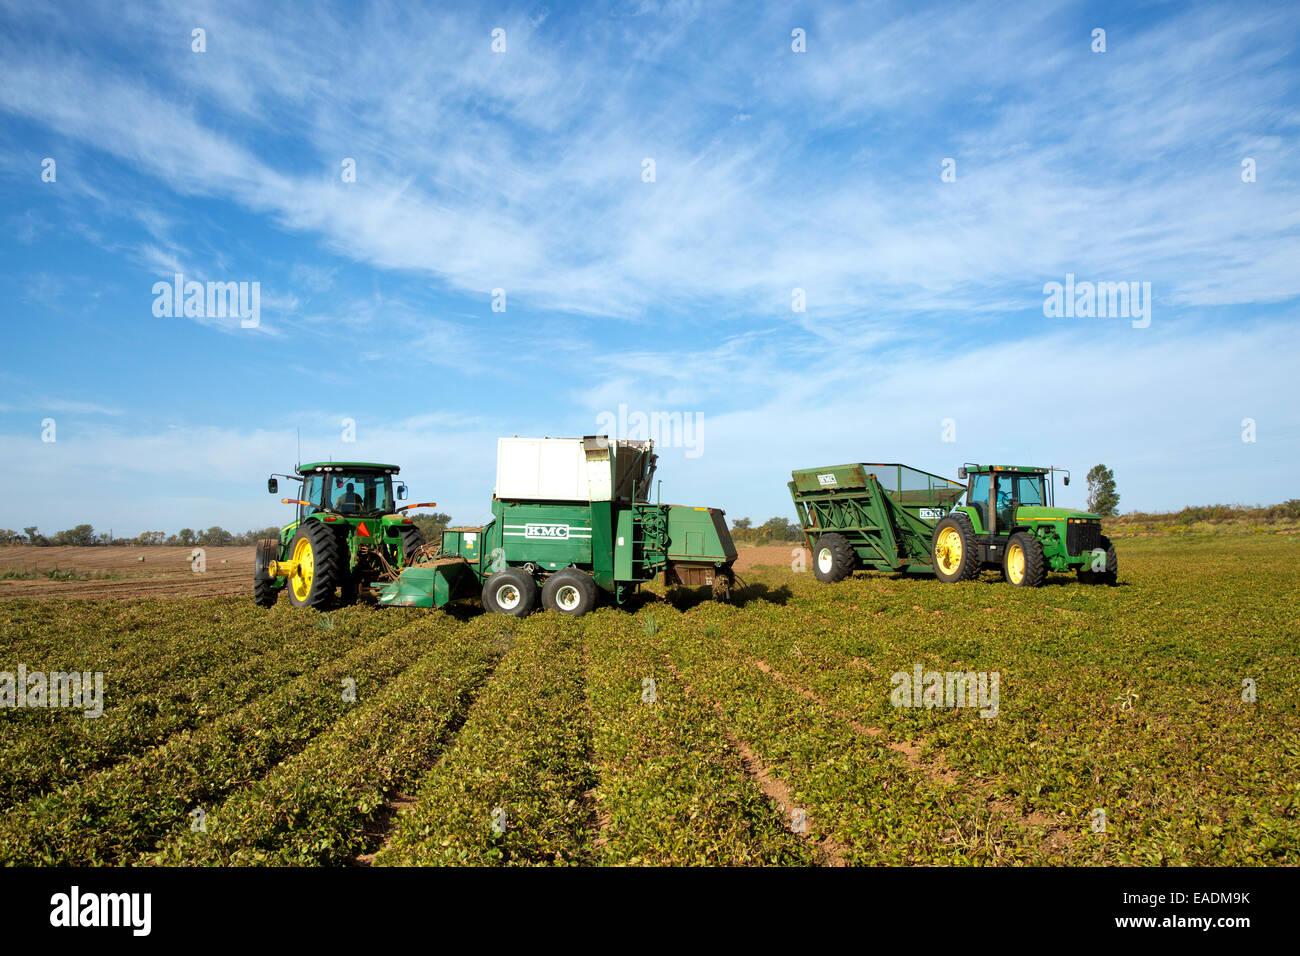 Peanut harvest, John Deere tractors, harvester & bankout wagon operating in field. - Stock Image